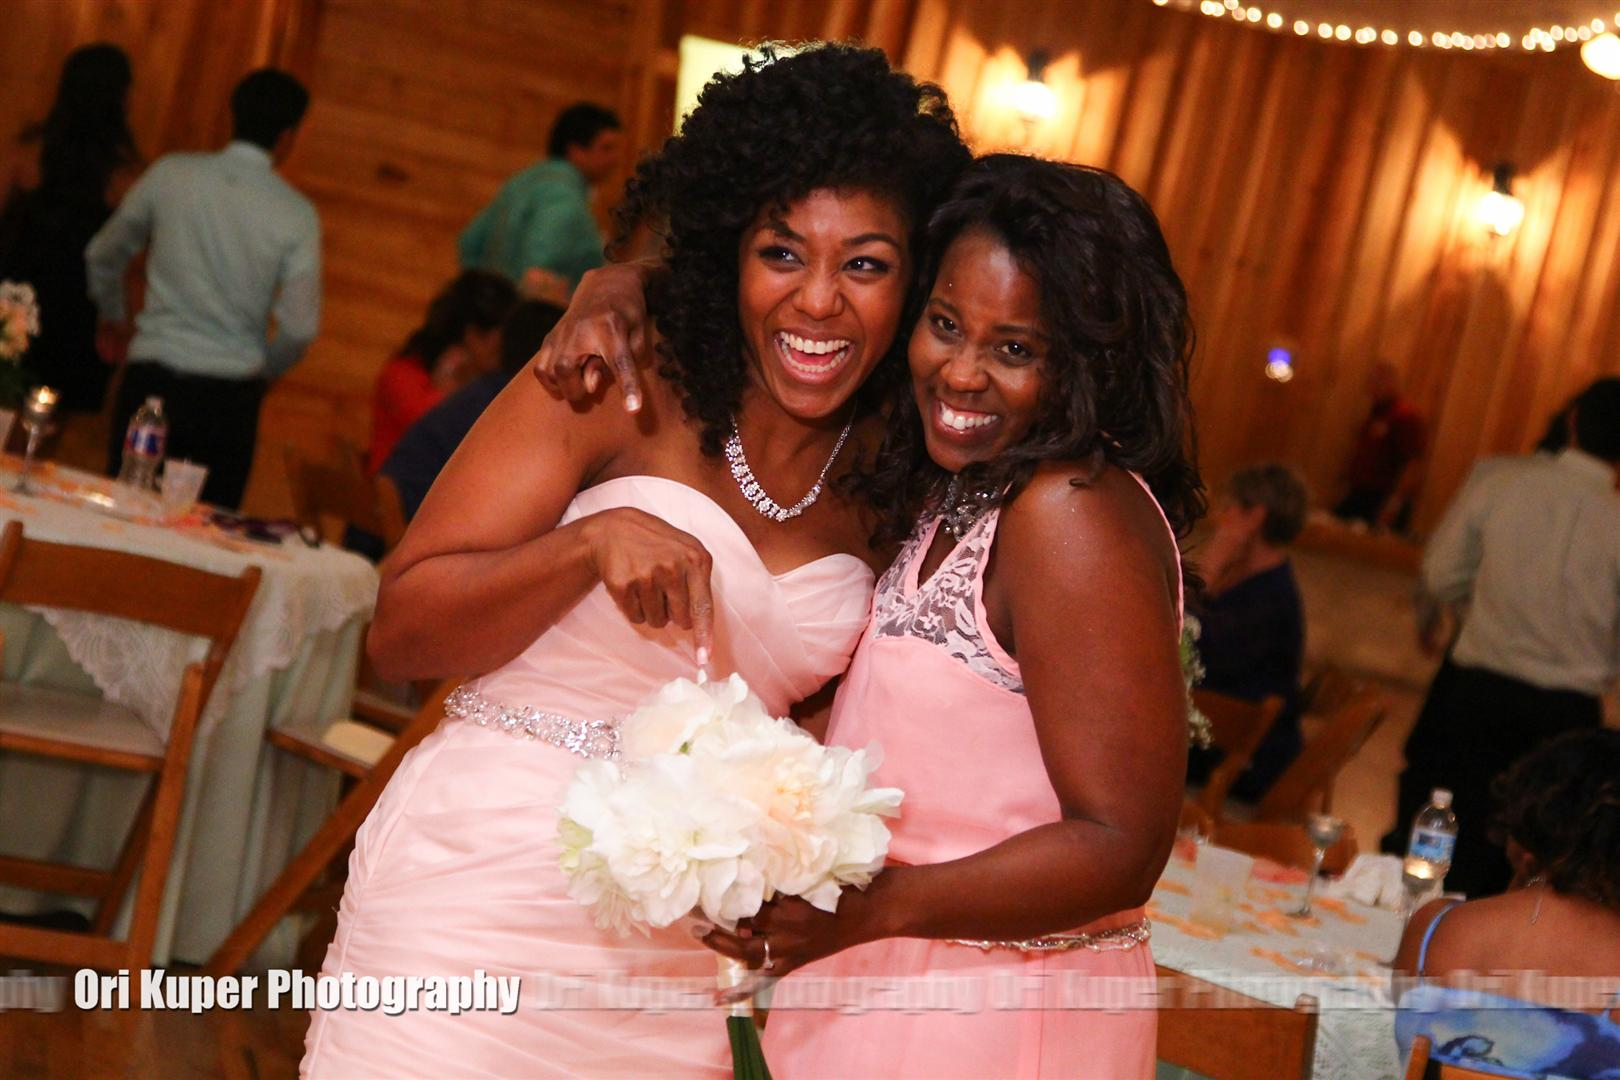 Ori Kuper Photography Weddings Josh Aubrey IMG_4872.jpg